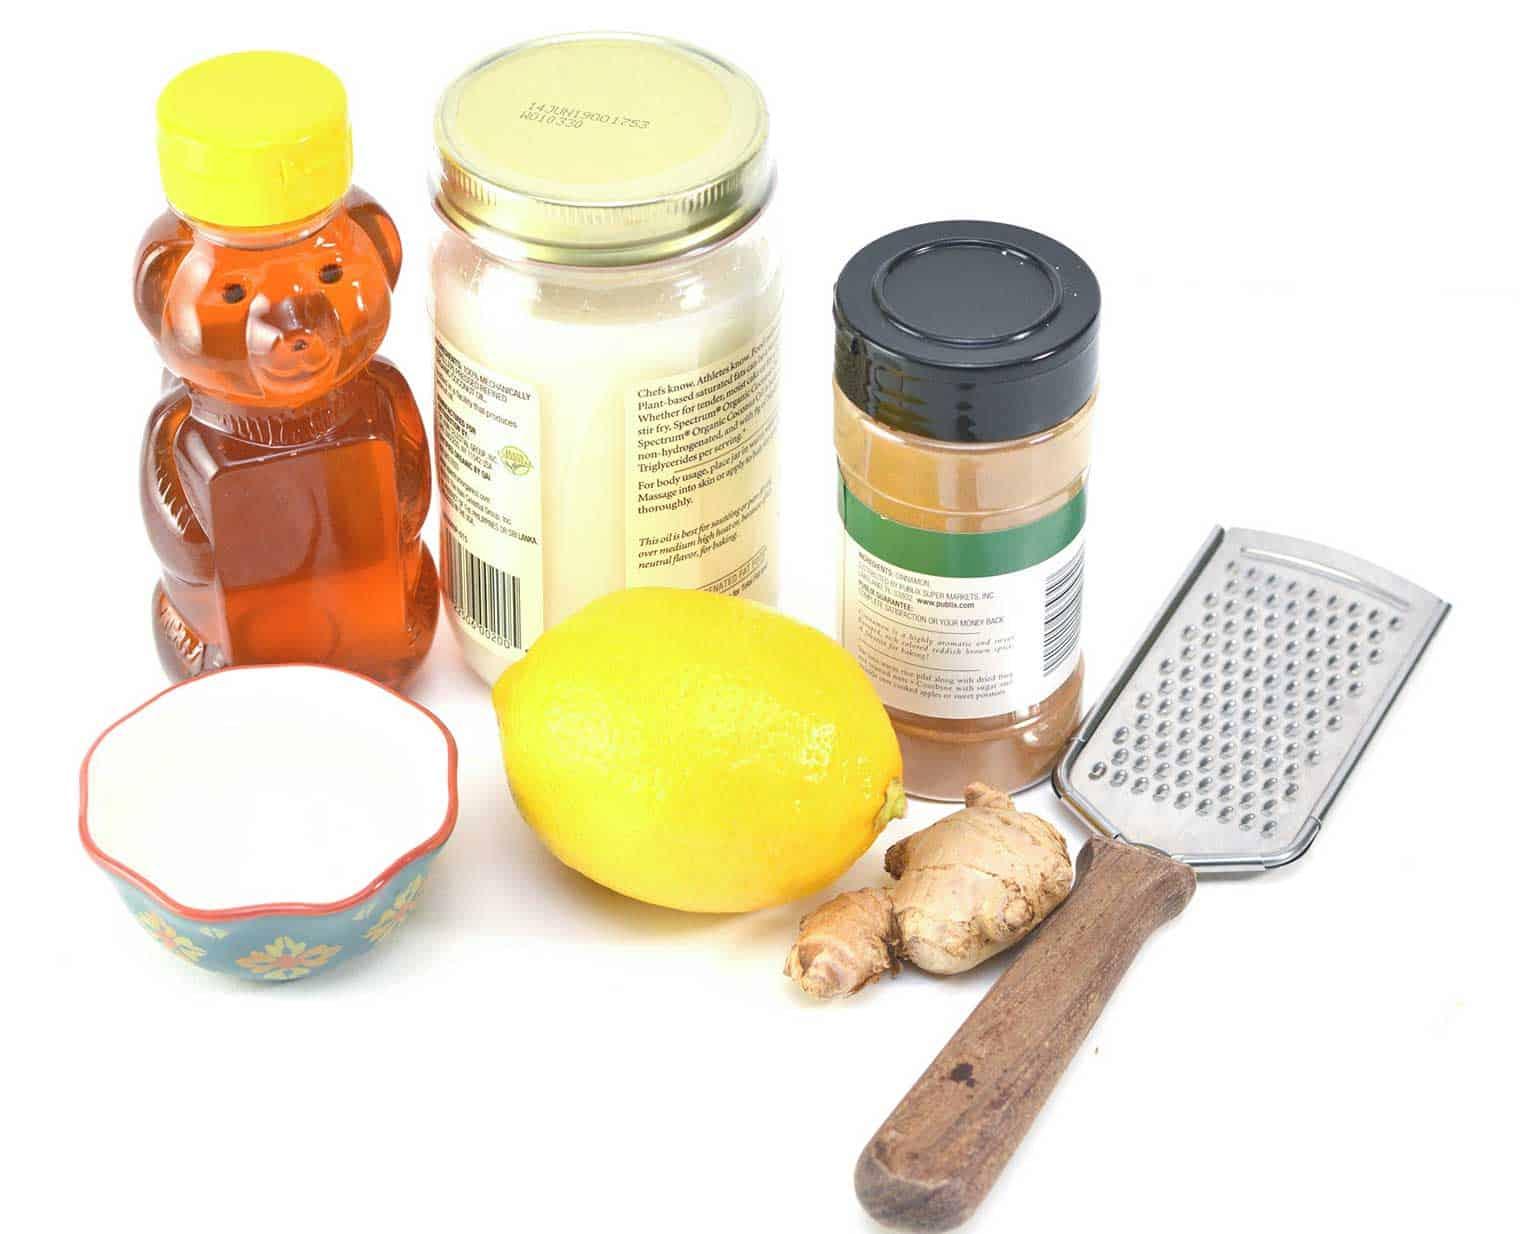 honey, coconut oil, ginger, lemon to make homemade cough syrup